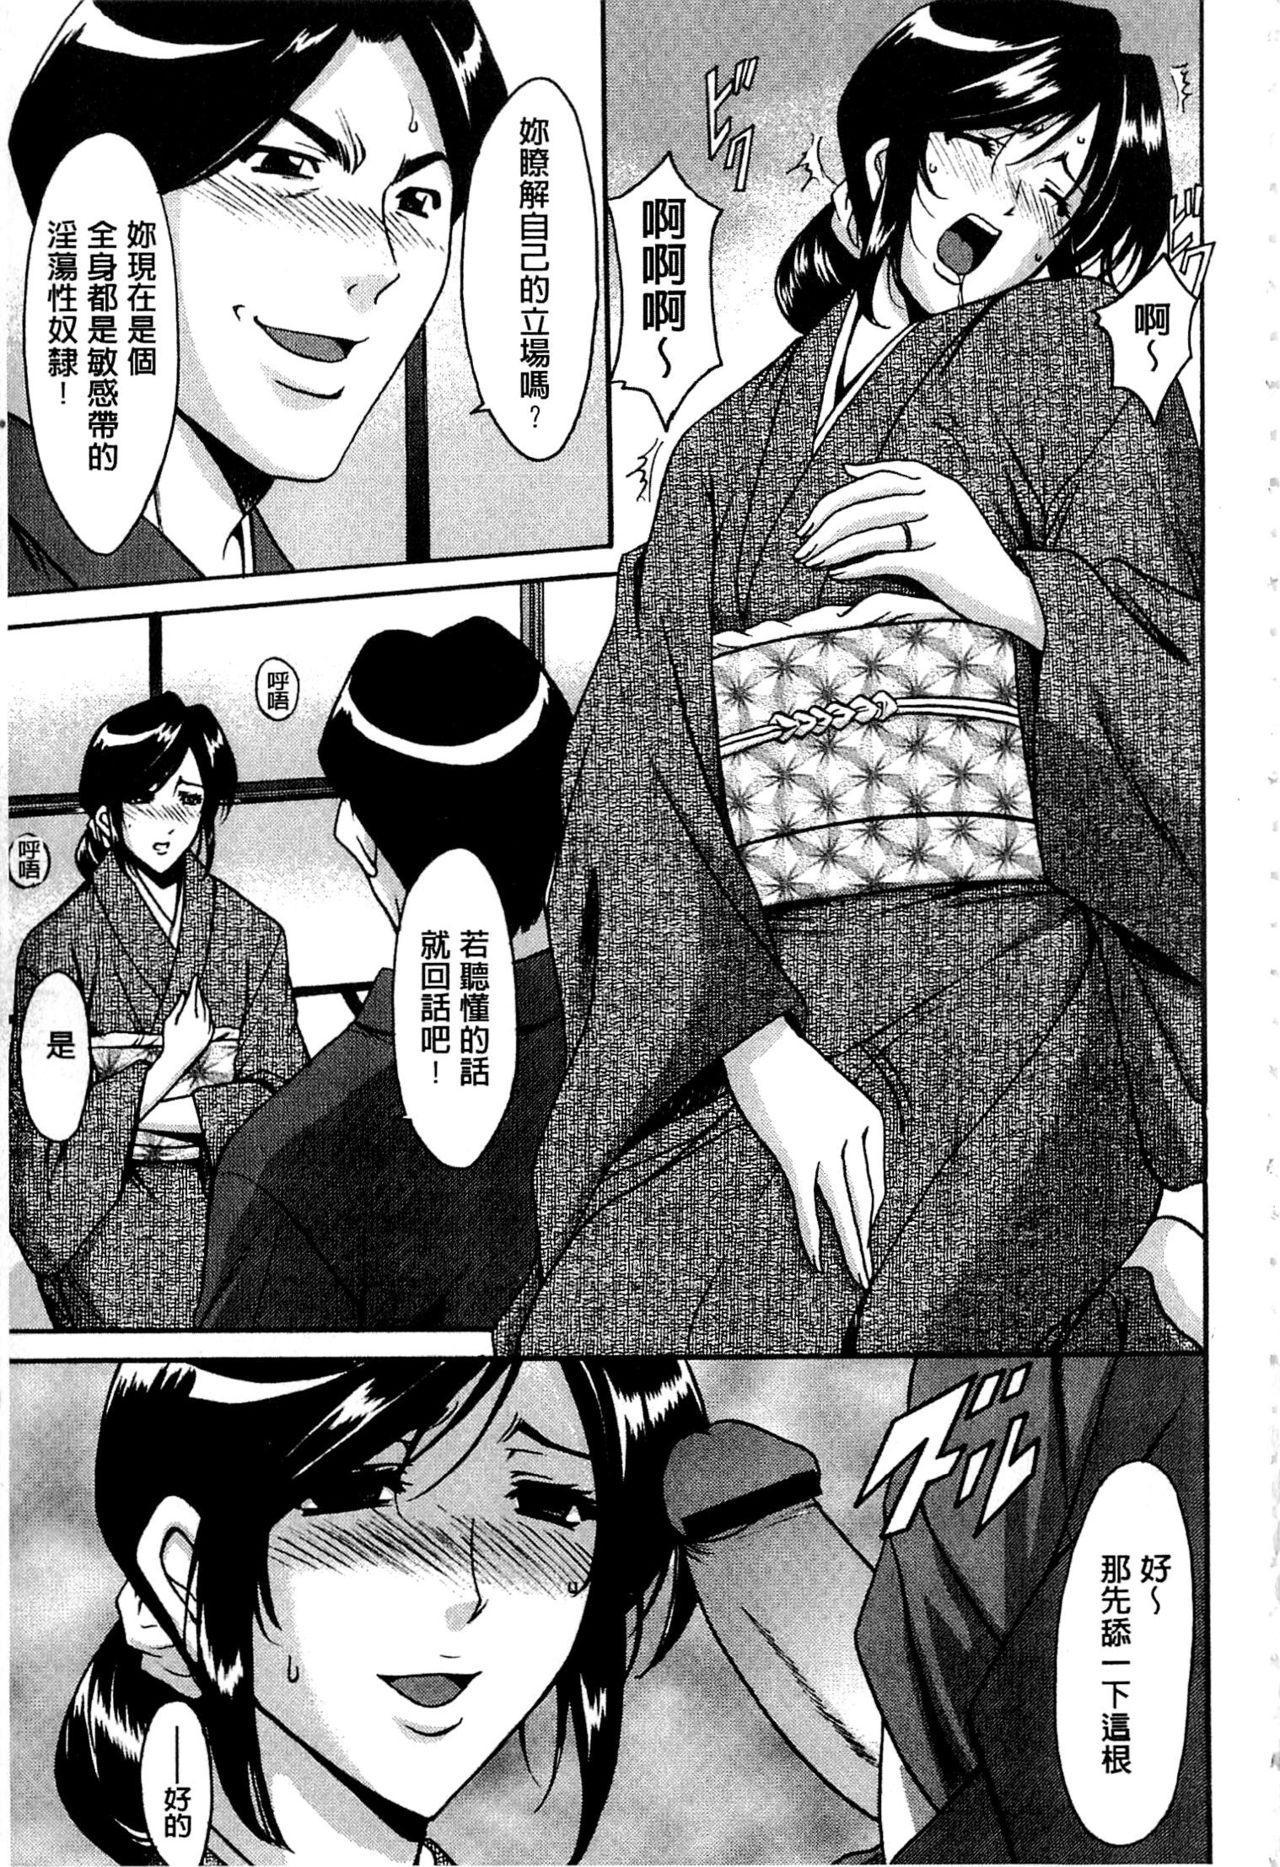 Sennyu Tsuma Satomi Kiroku | 臥底人妻里美 洗腦凌辱的記錄 上集 144